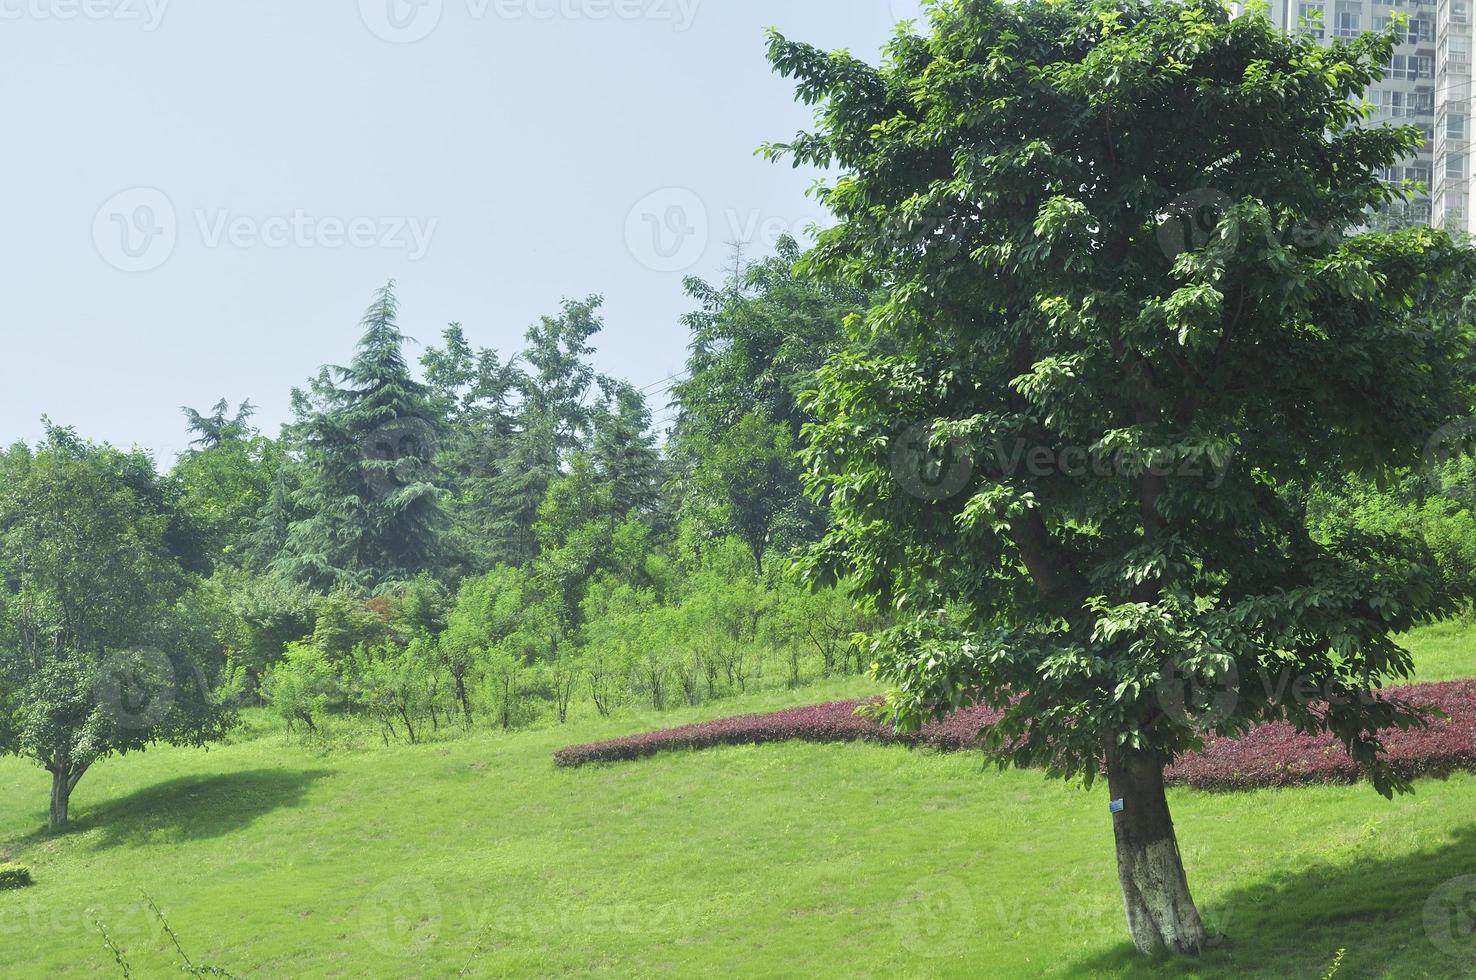 lugn trädgård foto